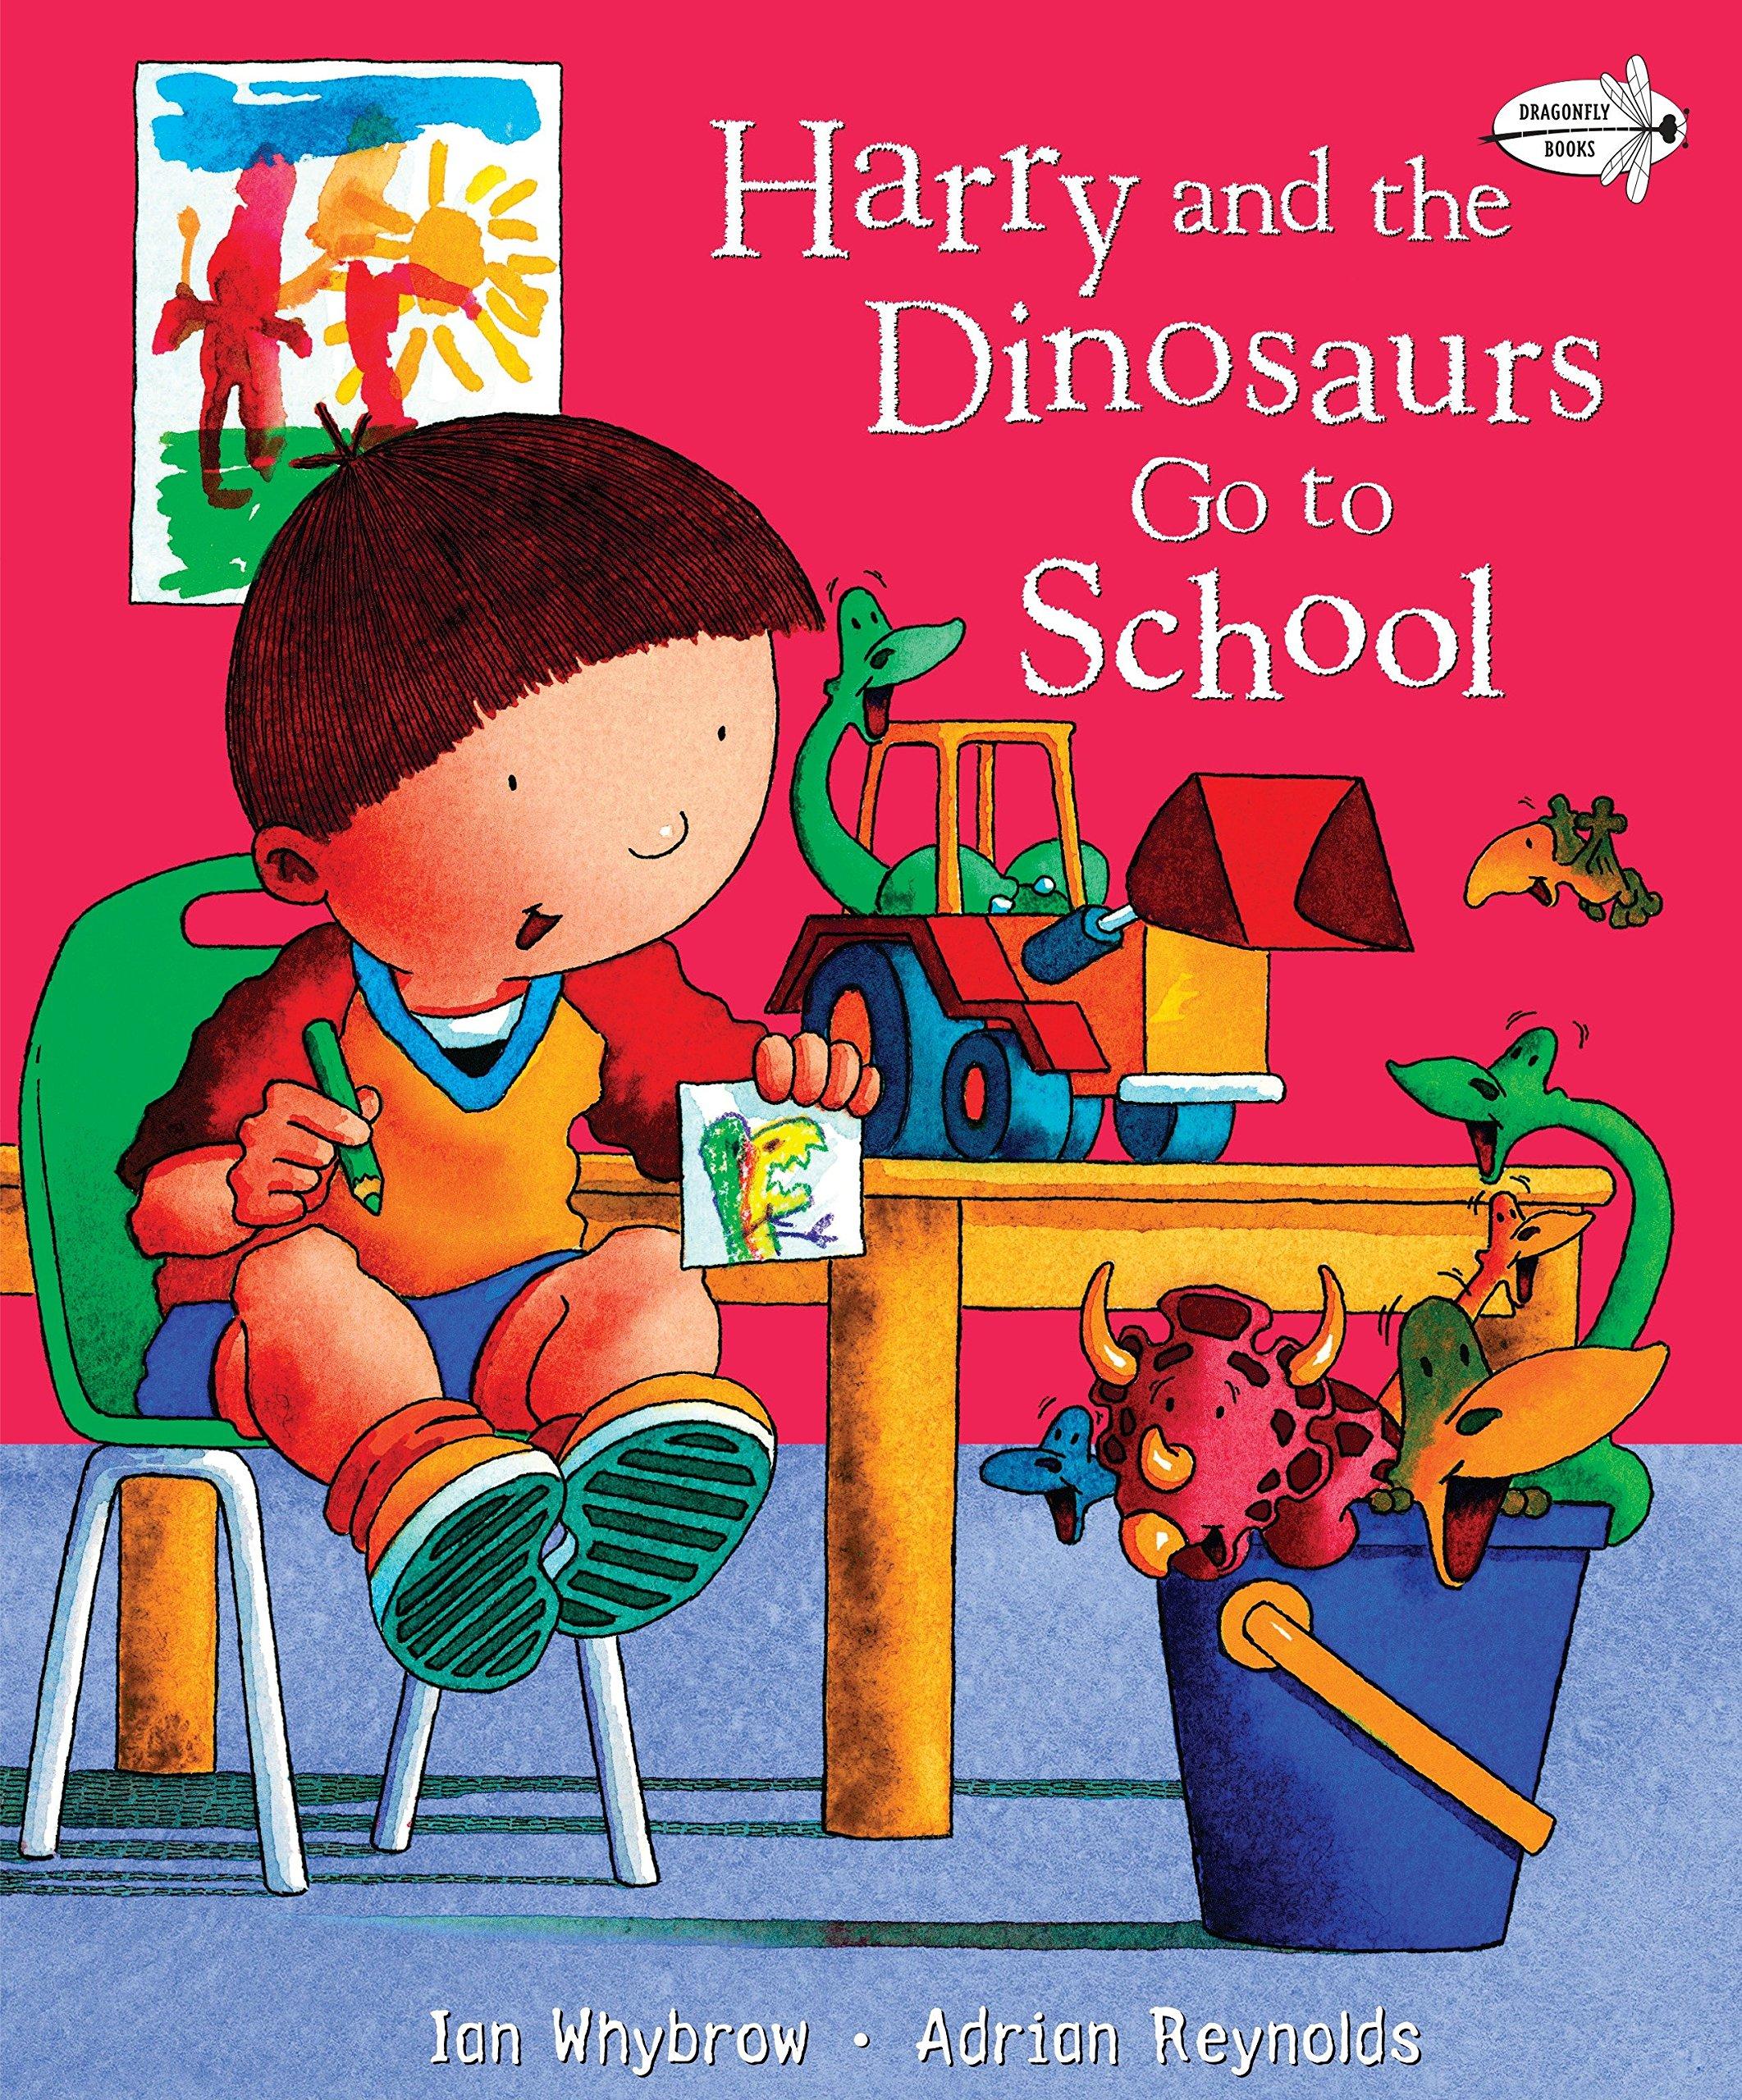 Harry and the Dinosaurs Go to School: Amazon.co.uk: Ian Whybrow ...